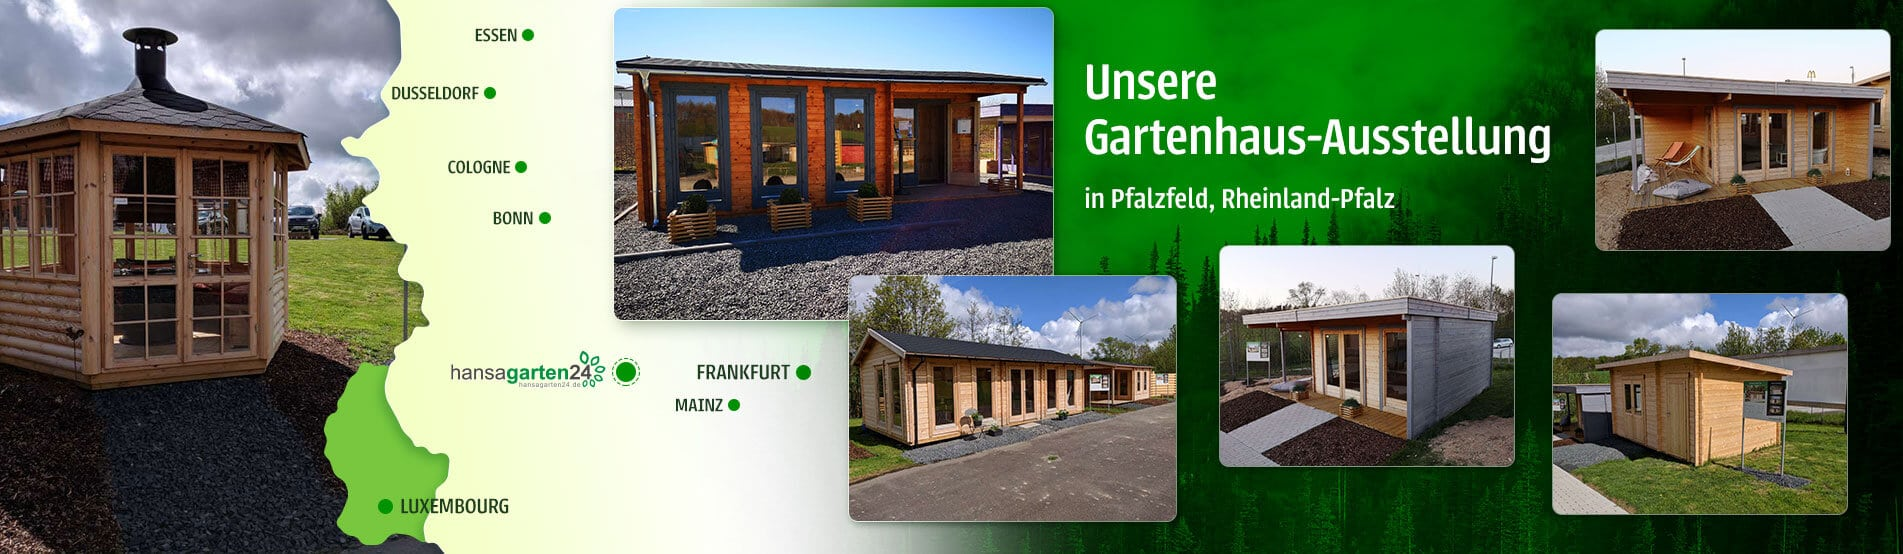 Hansagarten24 Gartenhaus-Ausstellung in Pfalzfeld